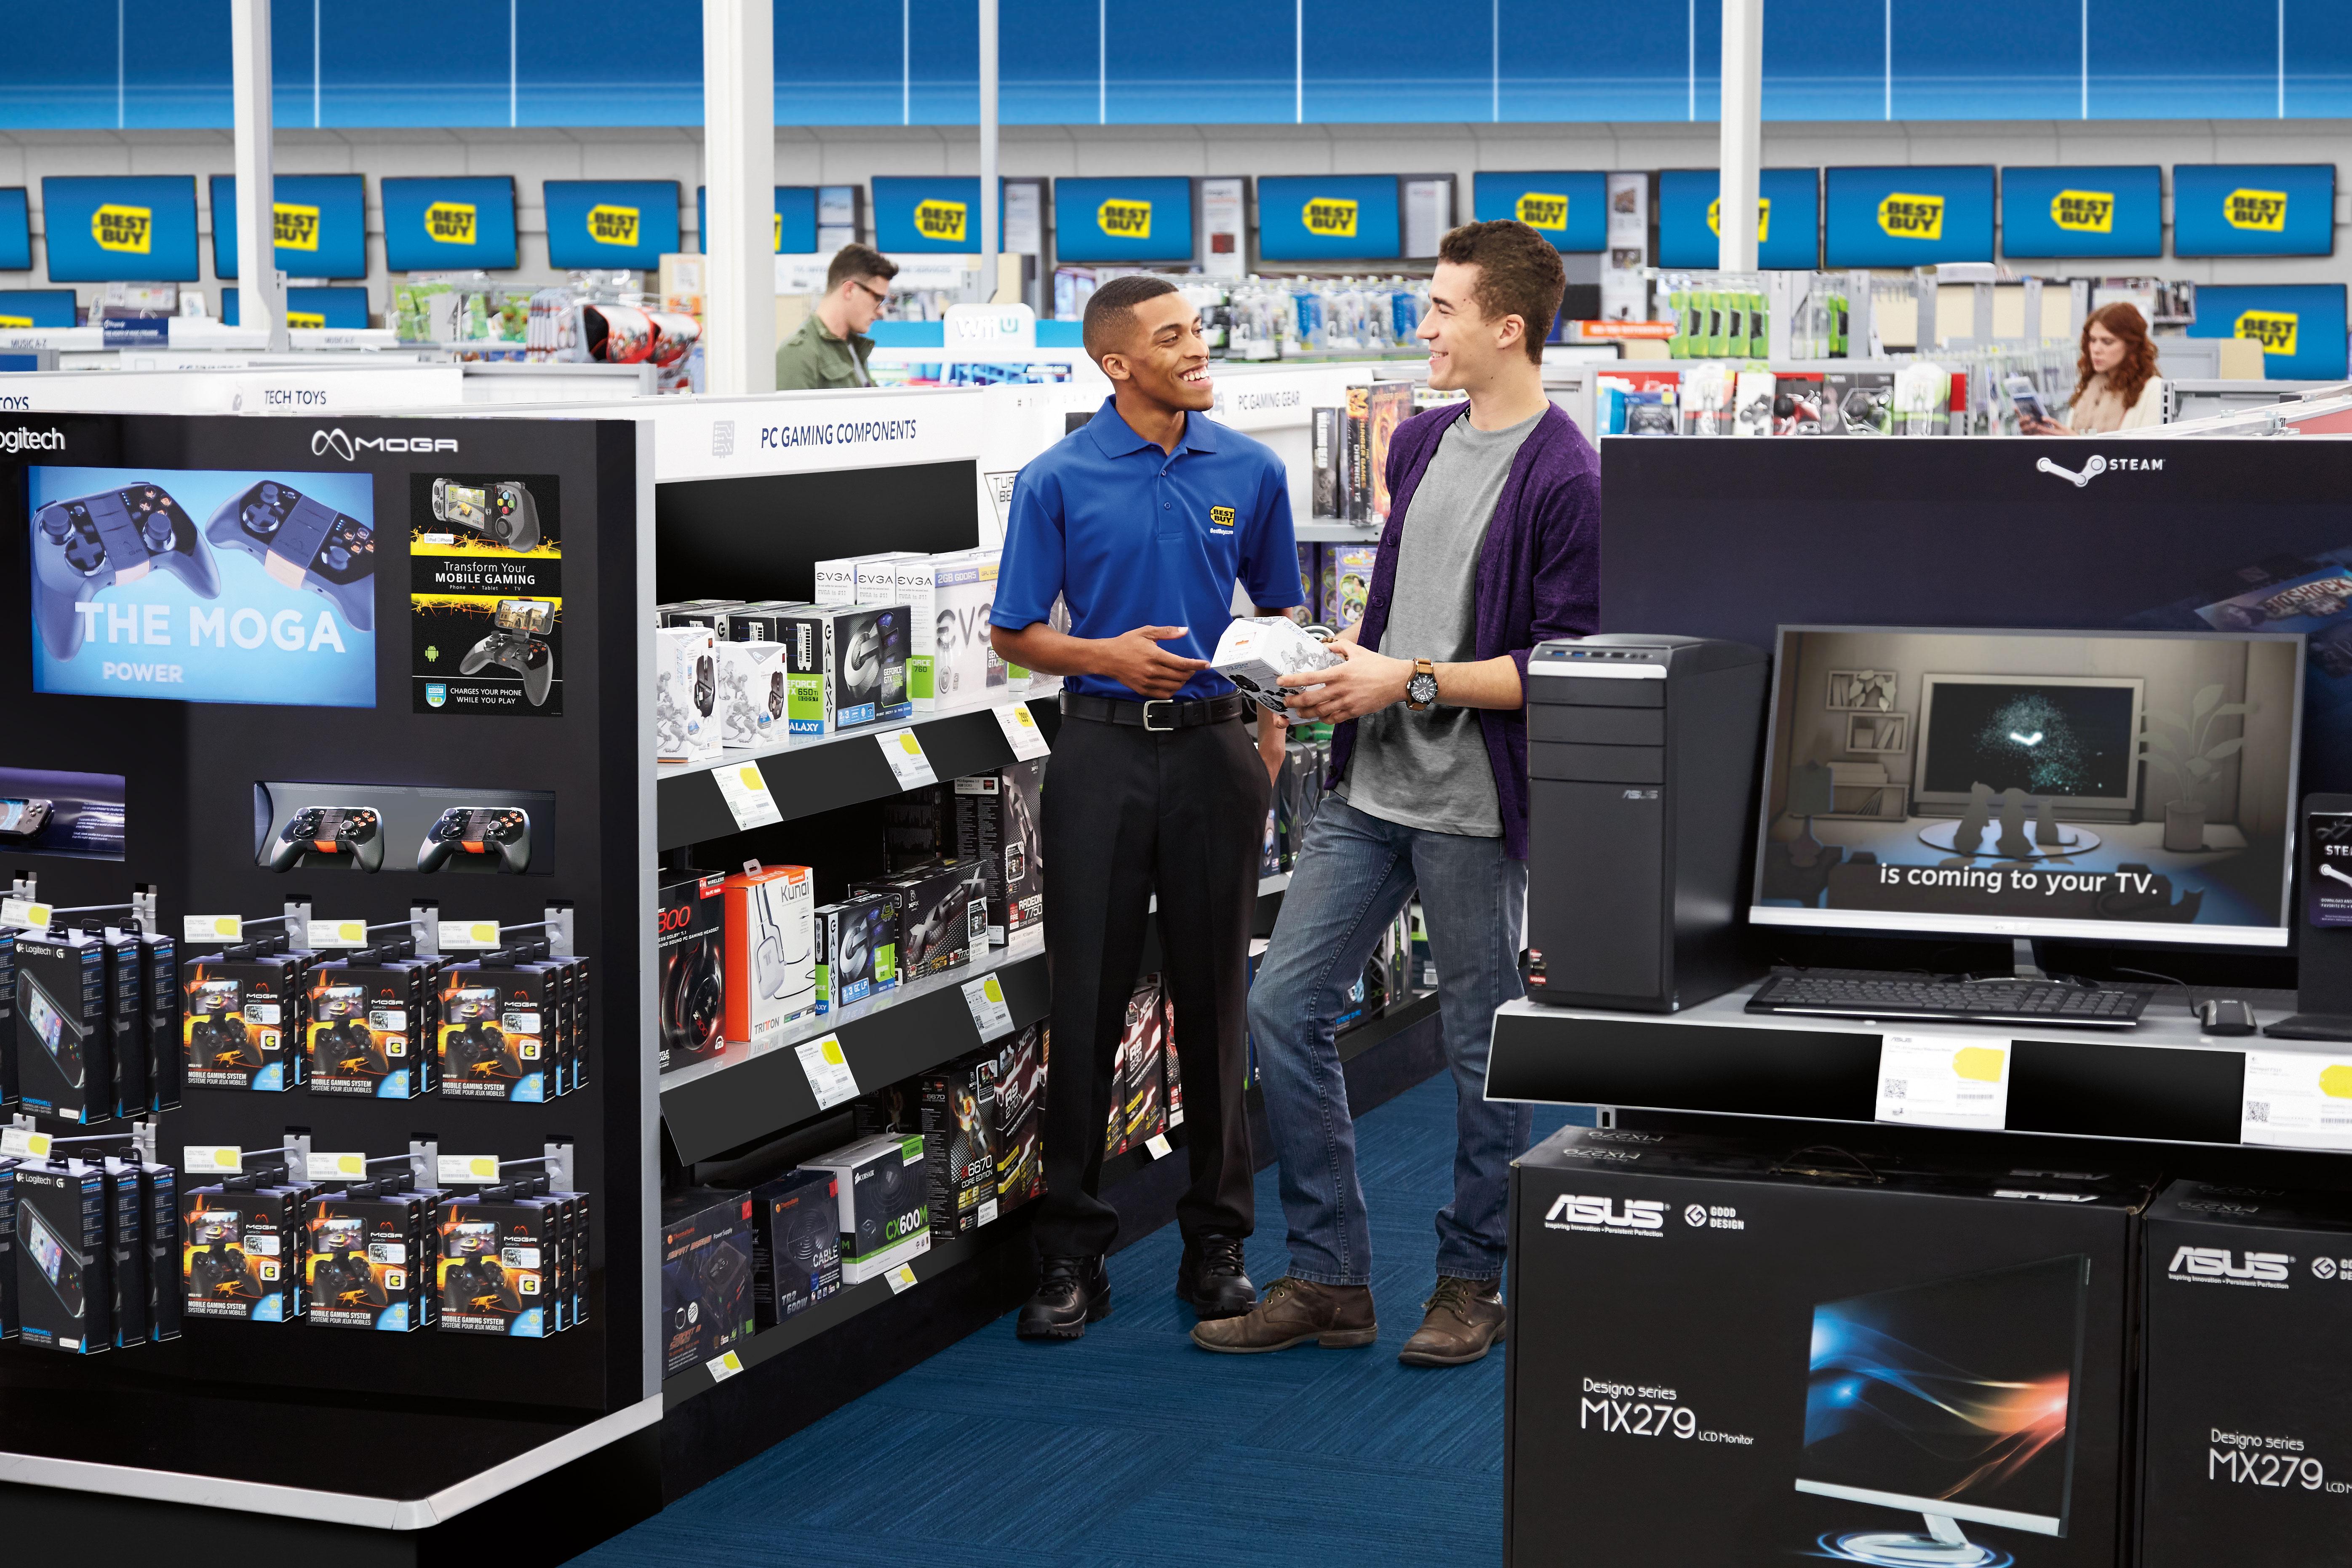 A Best Buy employee helping a customer inside a store.